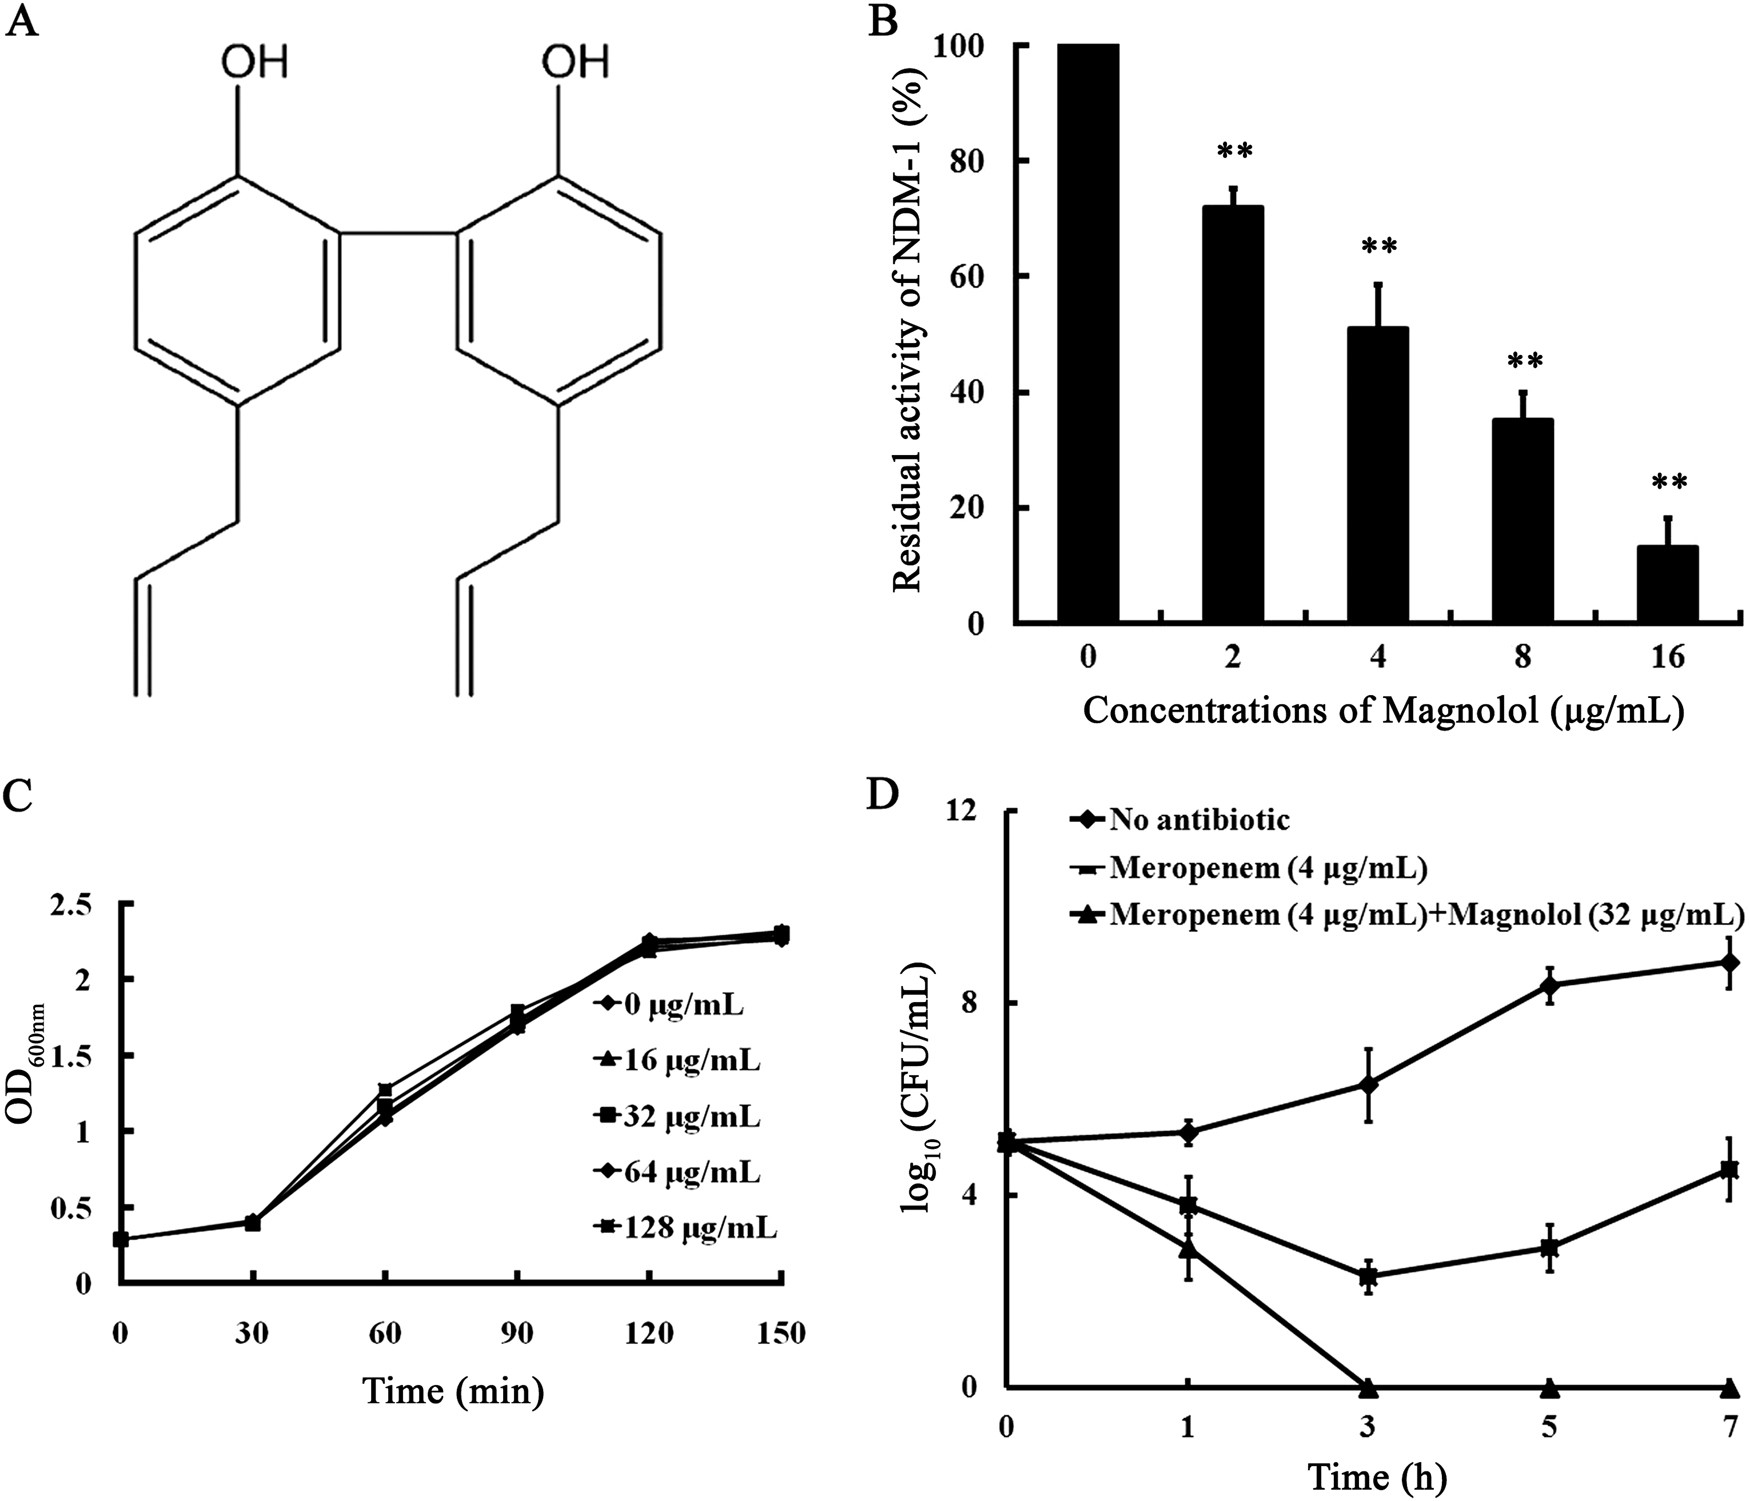 Magnolol restores the activity of meropenem against NDM-1